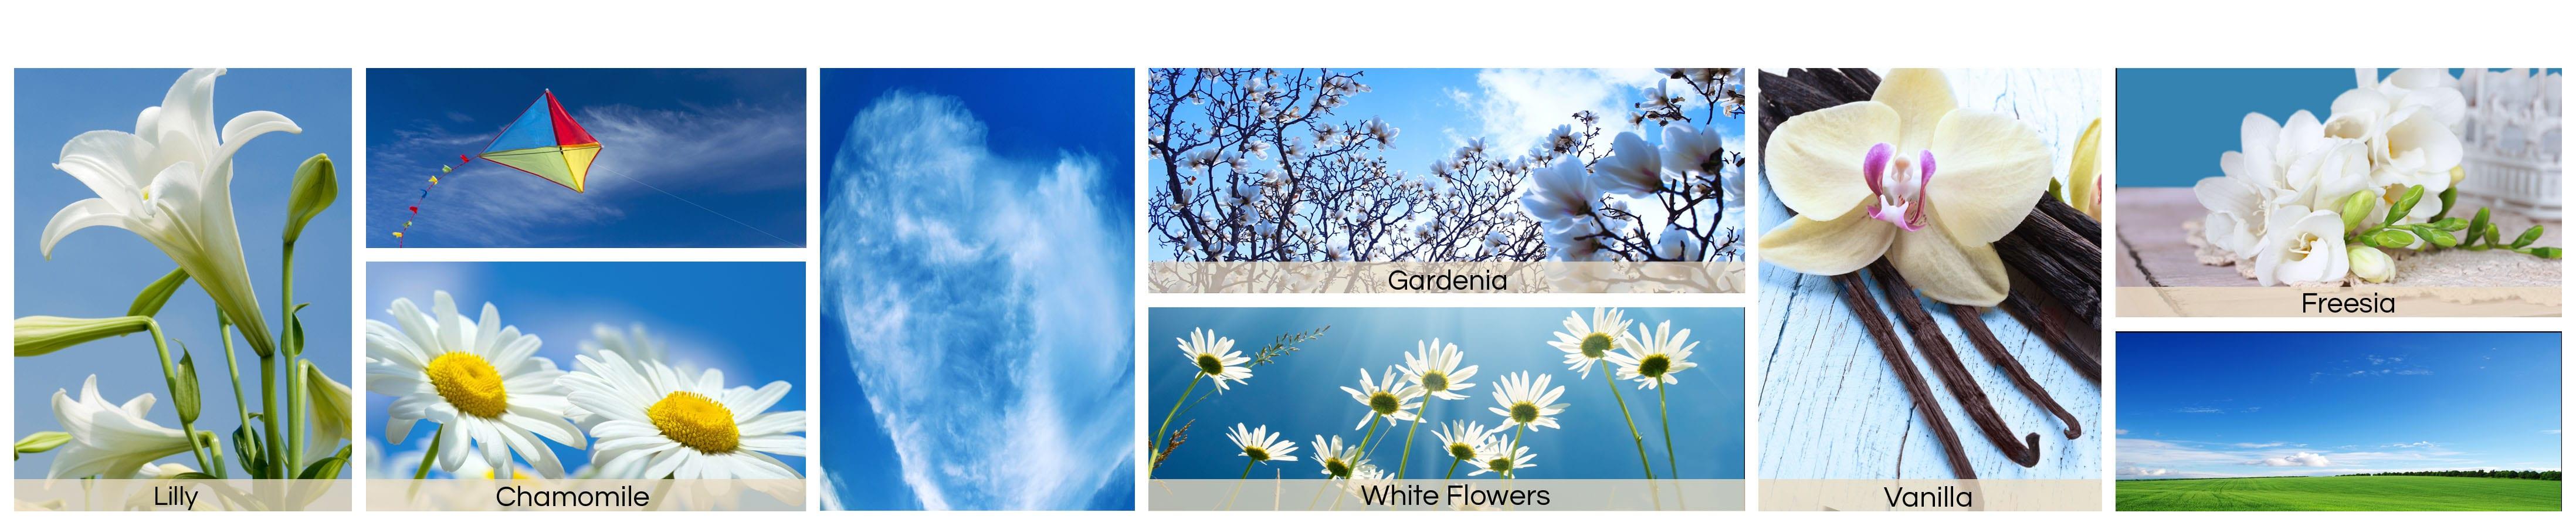 cerulean-sky-jpg576030eb801ca-min591c011841091